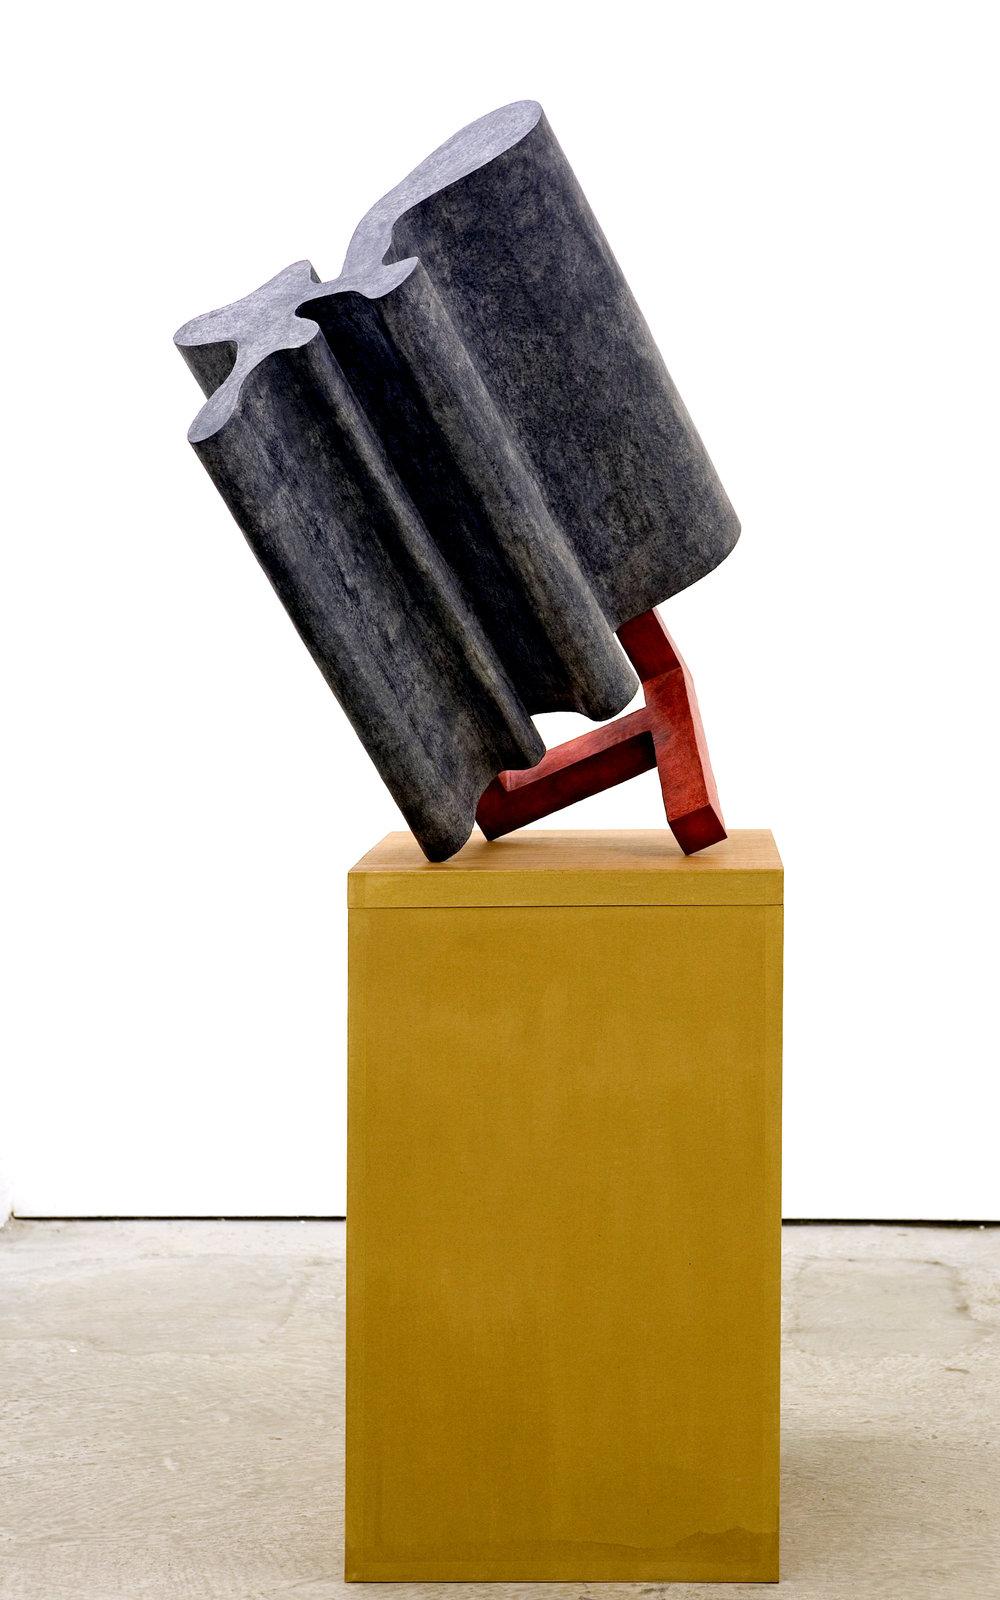 Untitled 2006 - 2009, newspaper, leaflets, printerpaper, inorganic household waste, ashes, wax. 146 x 66 x 61 cm. (incl. box/pedestal). Photo: W.Vermaase.